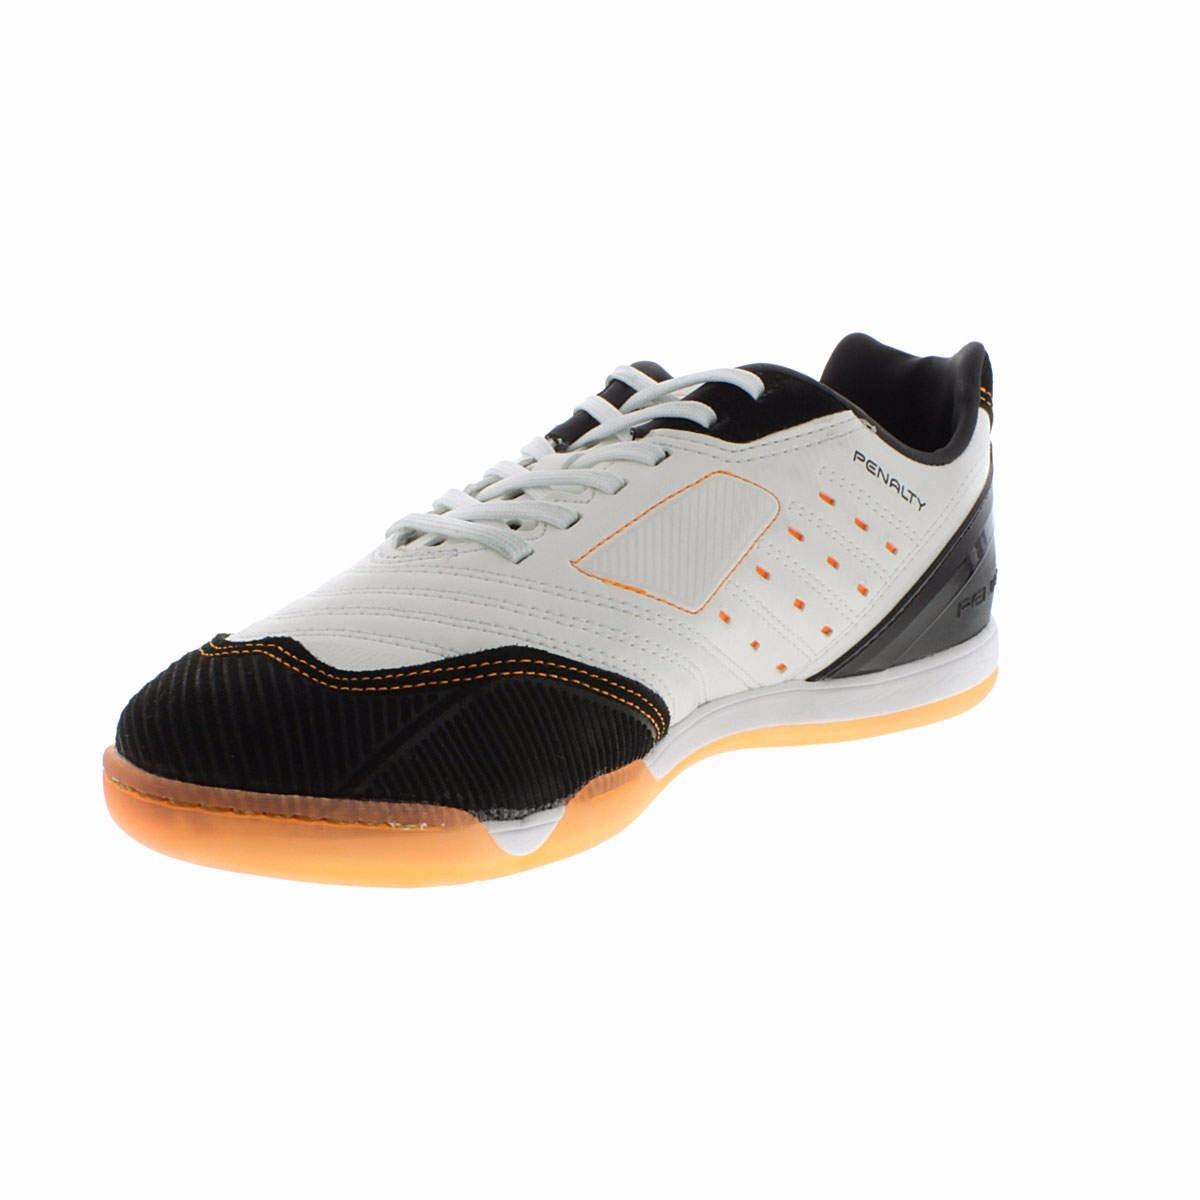 60b77d0120 chuteira de futsal profissional penalty max 500. Carregando zoom.